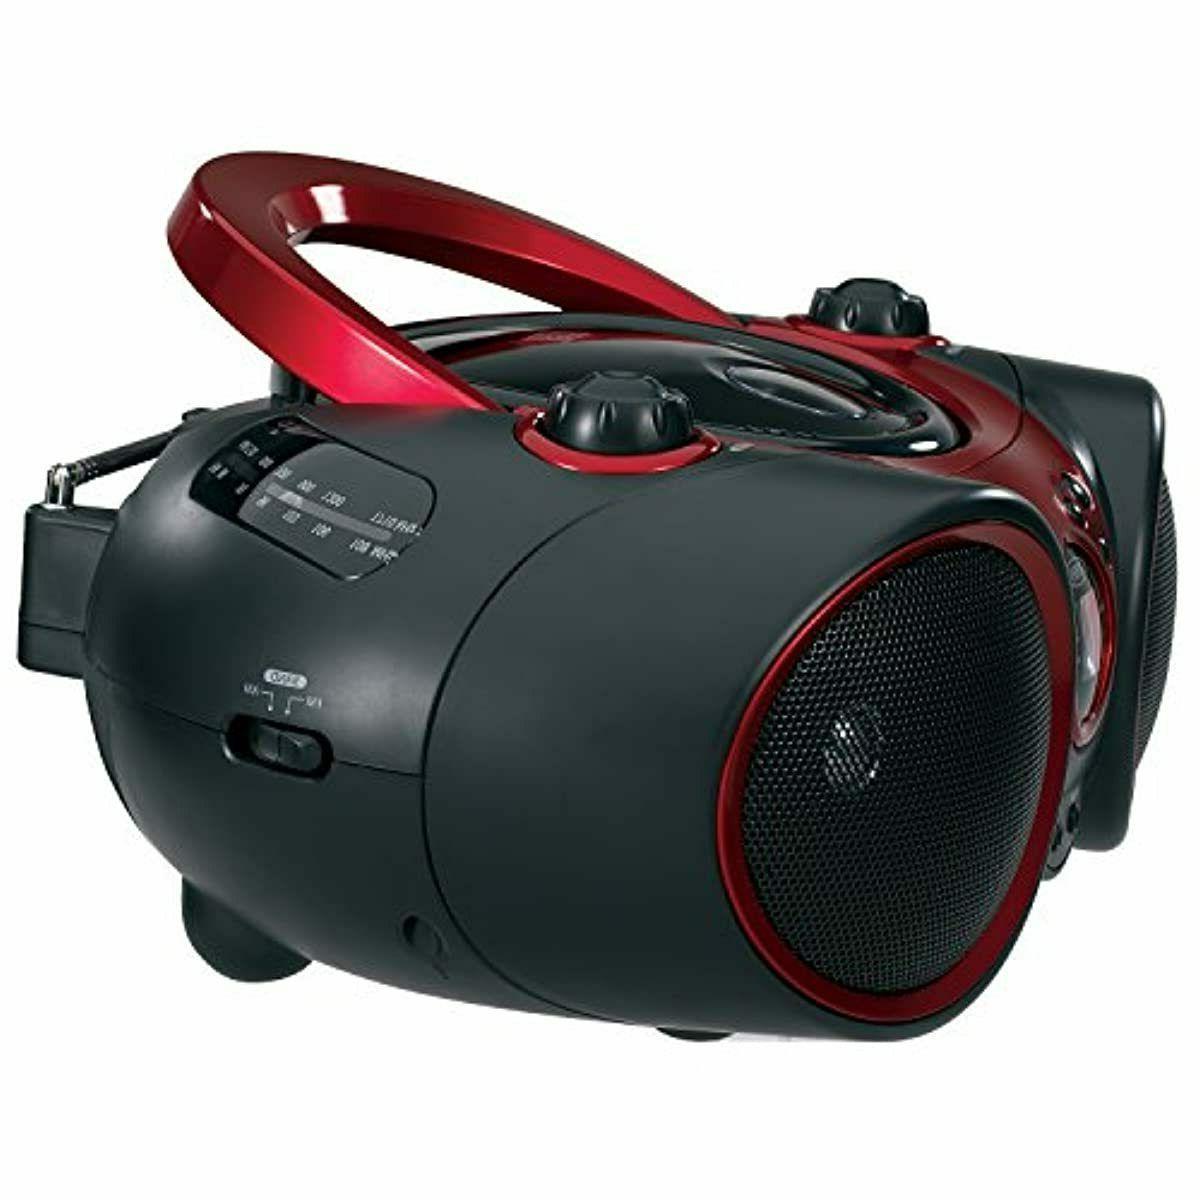 JENSEN Portable Radio Aux Red an